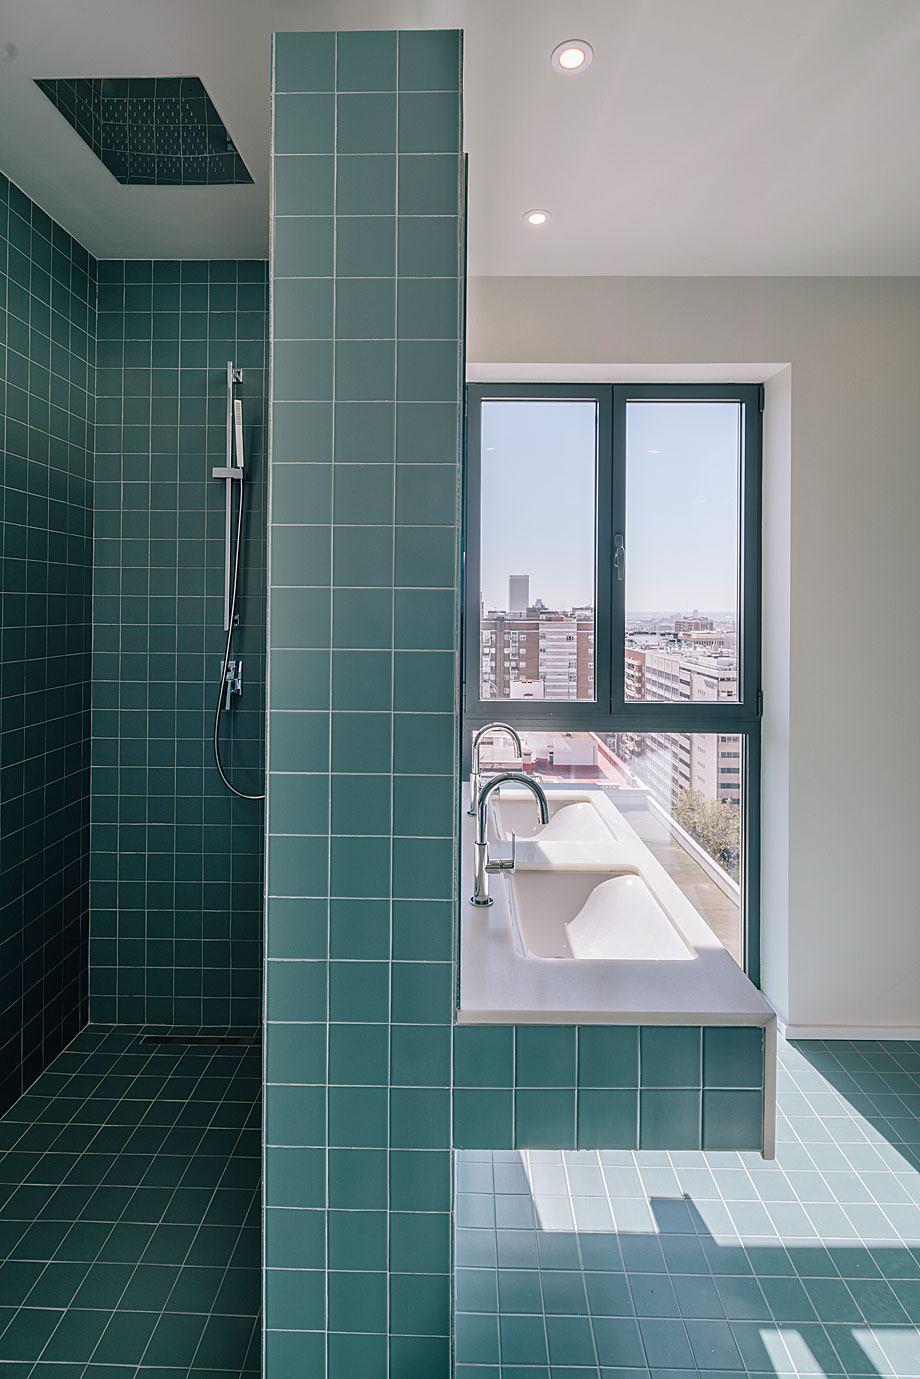 vivienda en madrid zooco estudio (31)